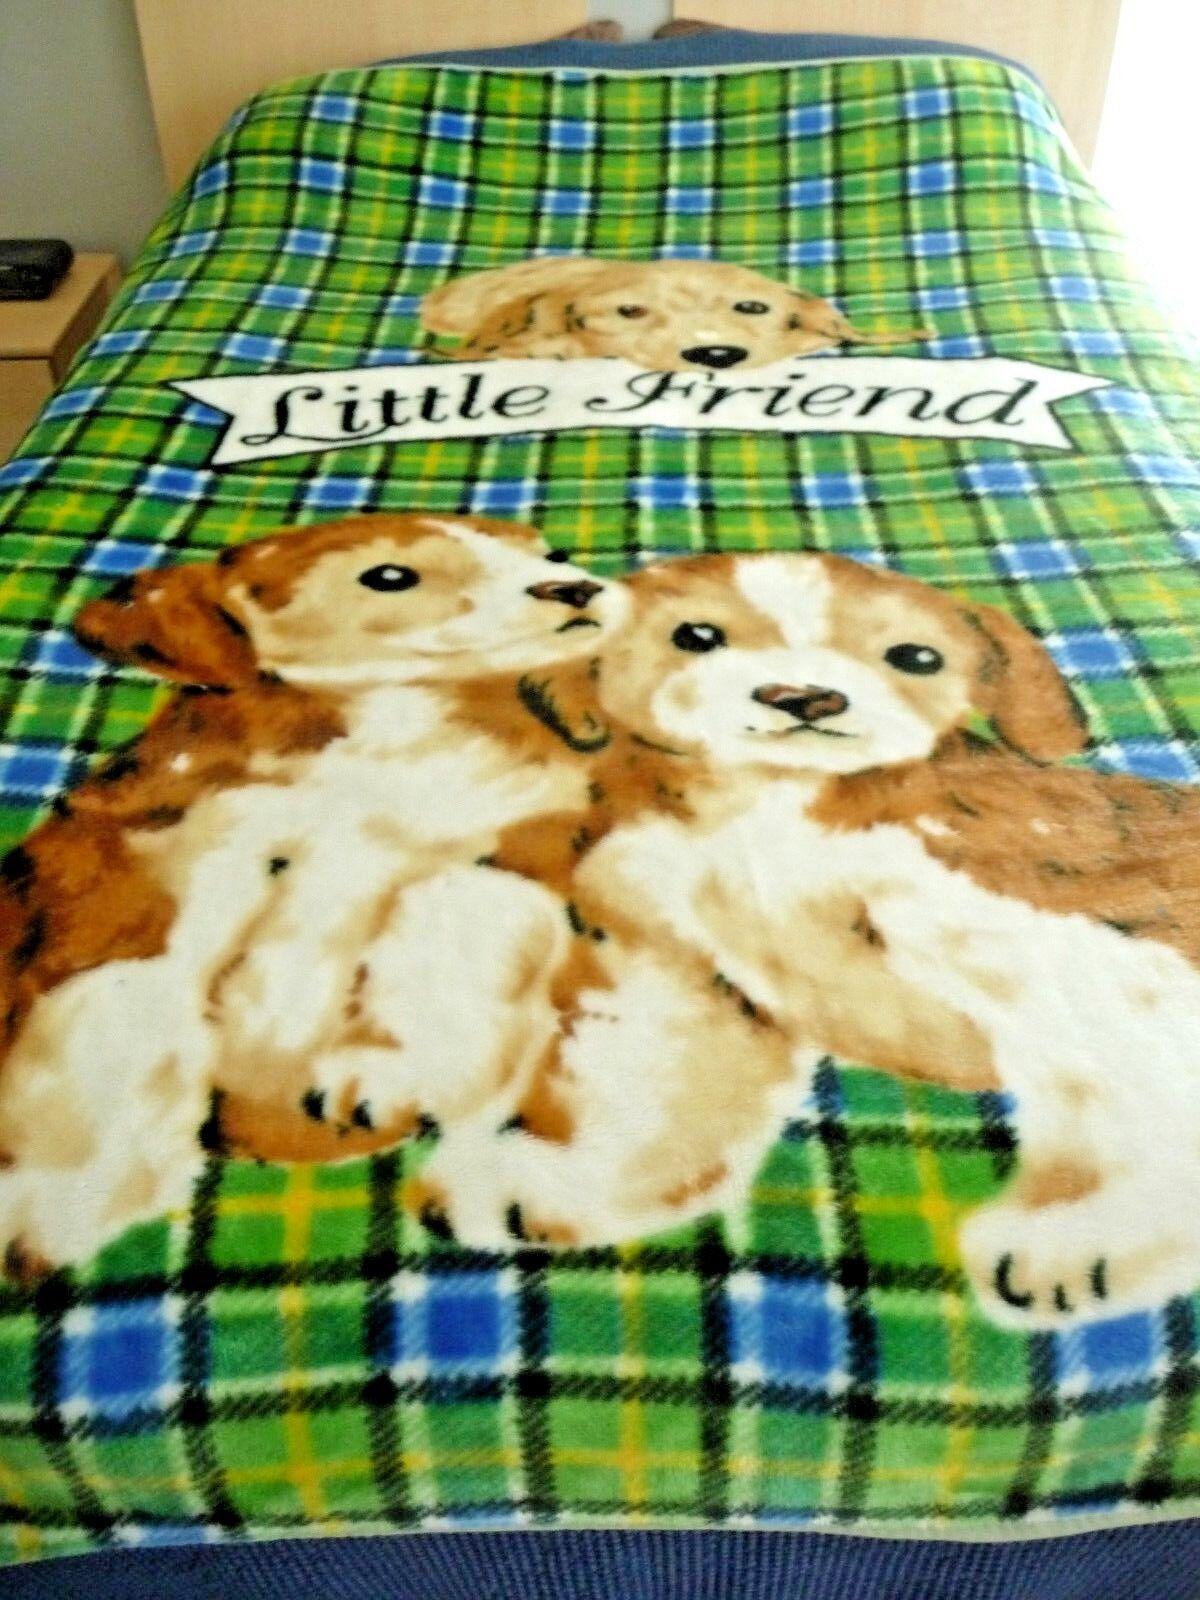 Vnt Mink Plush Blanket Throw Little Friend golden Lab Puppies Plaid 68 x80  CUTE